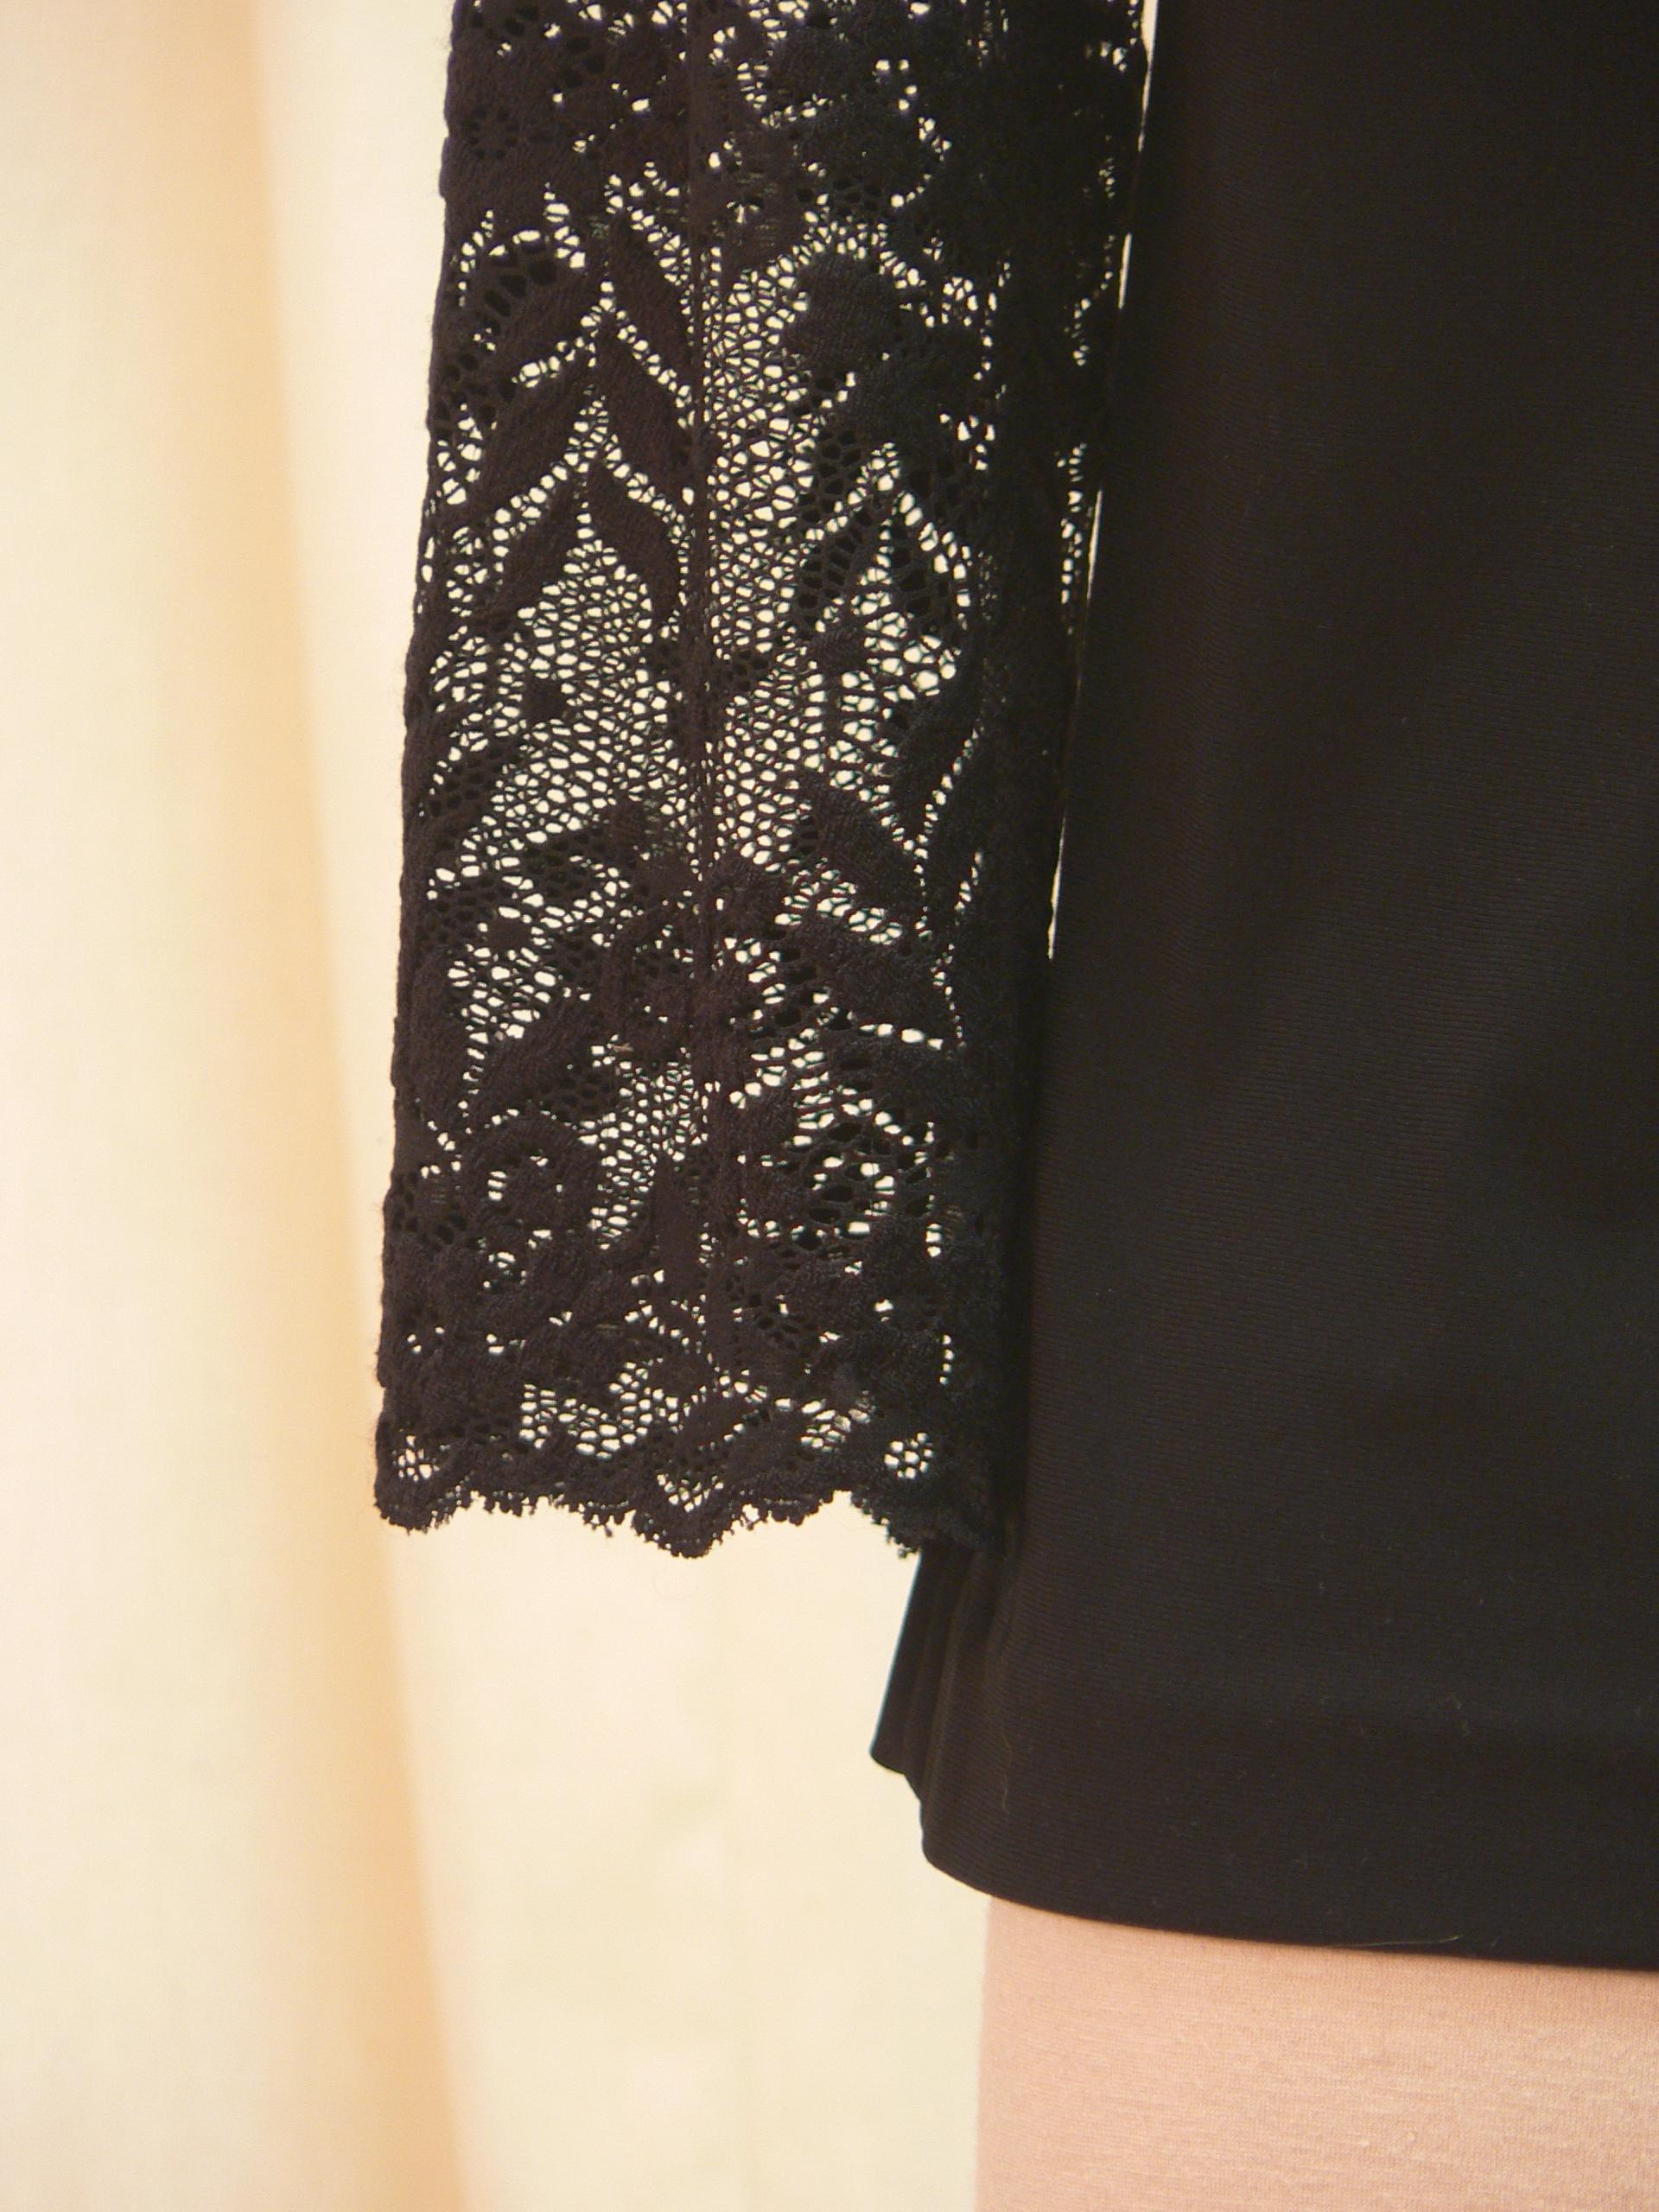 blouse14_sleeve_detail.JPG